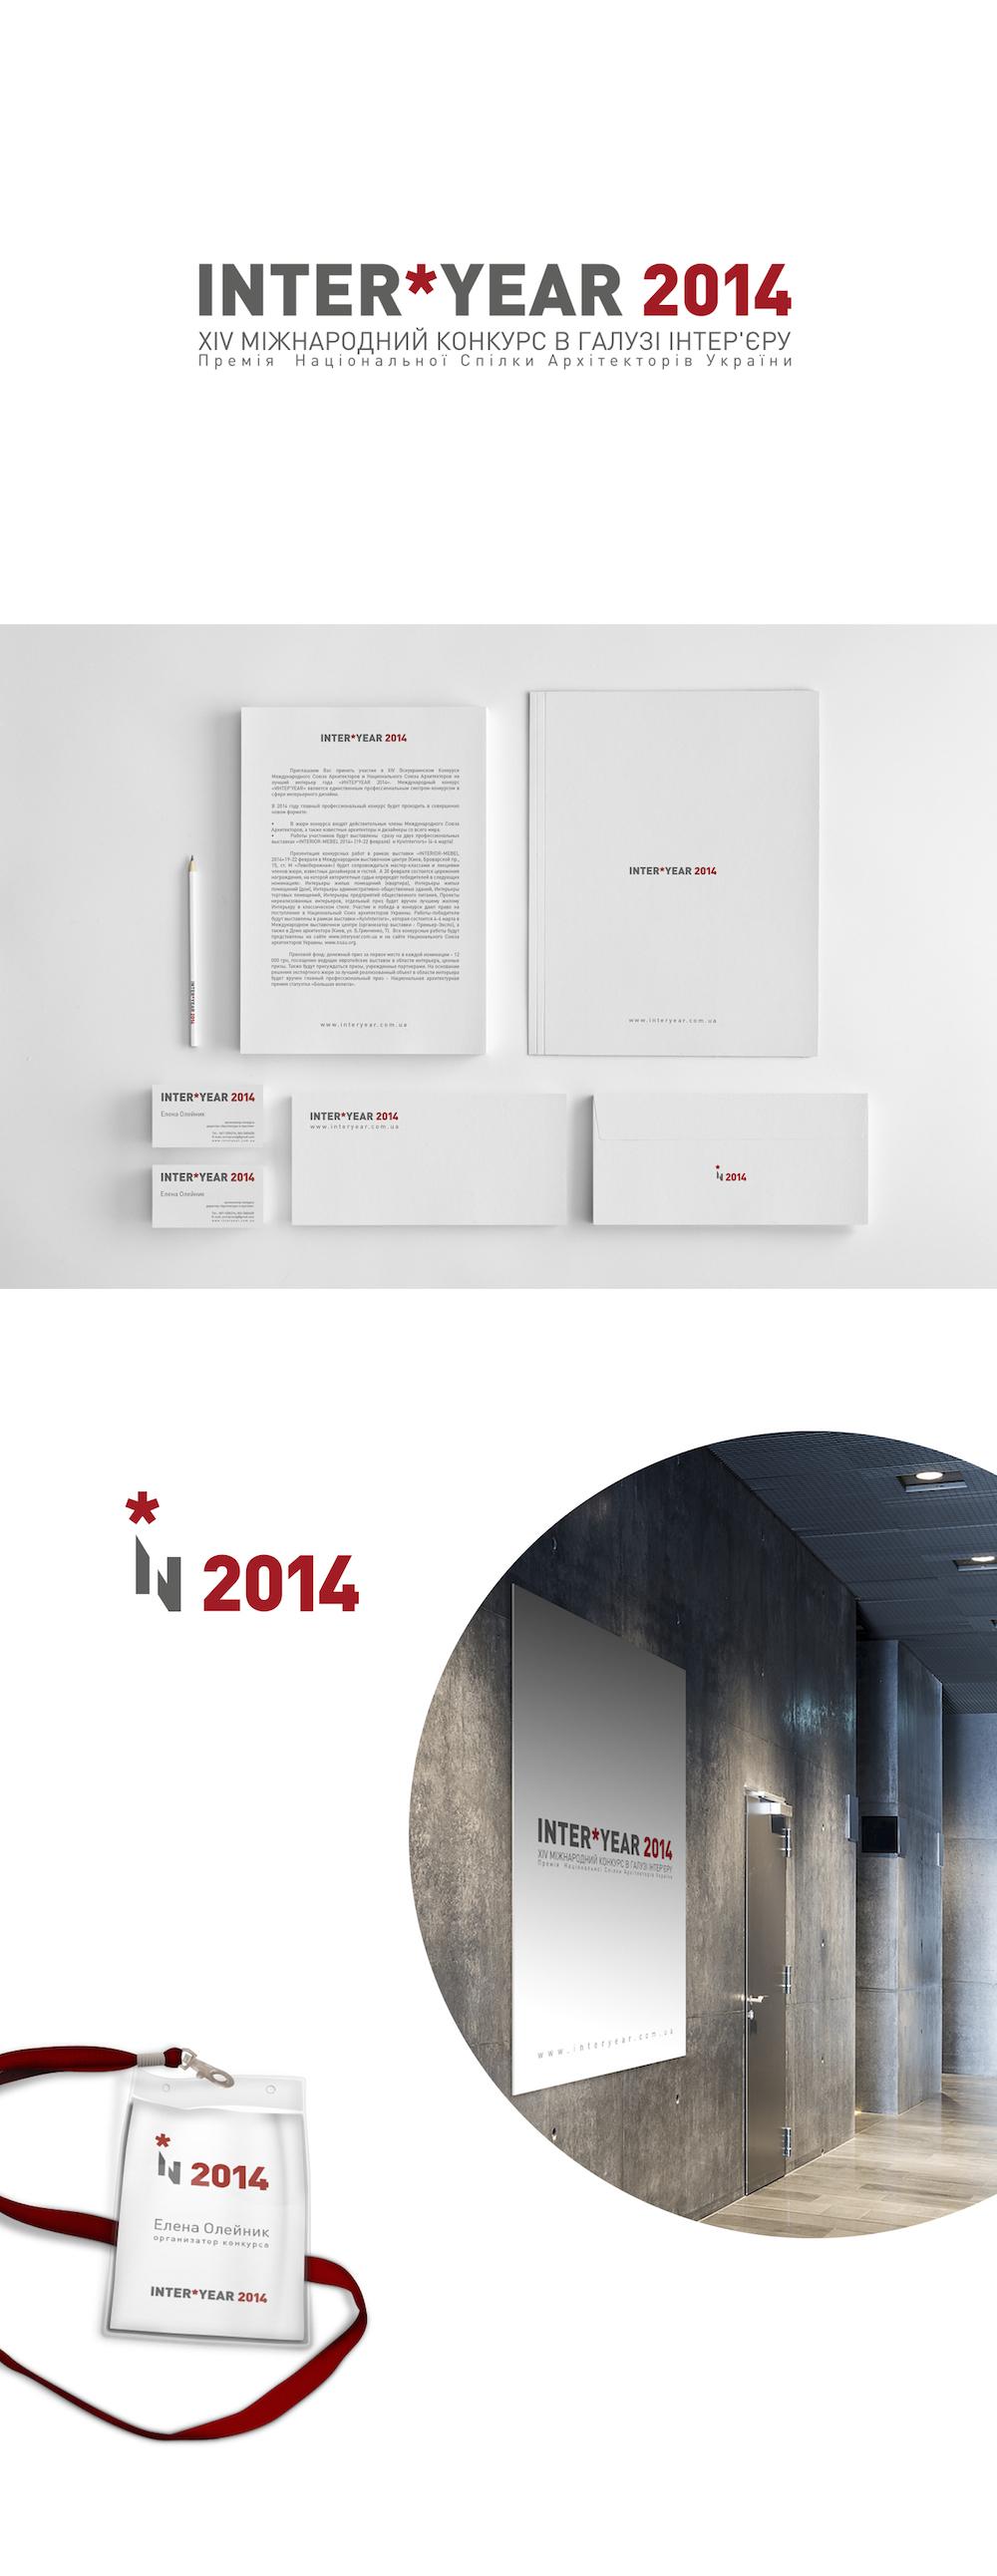 Inter*YEAR 2014 - Branding